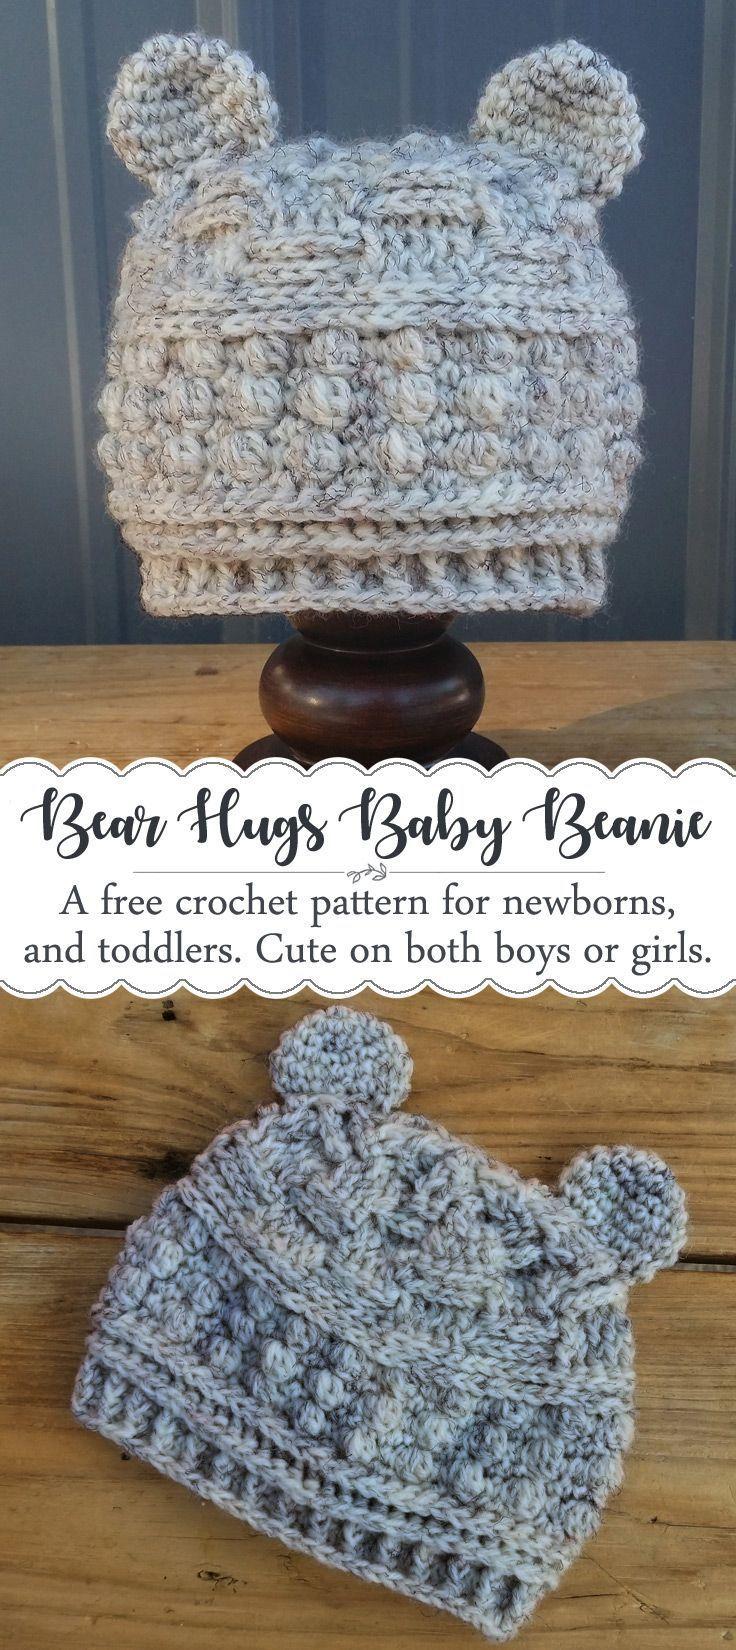 Pattern - Bear Hugs Baby Beanie   Gorros, Tejido y Gorro tejido